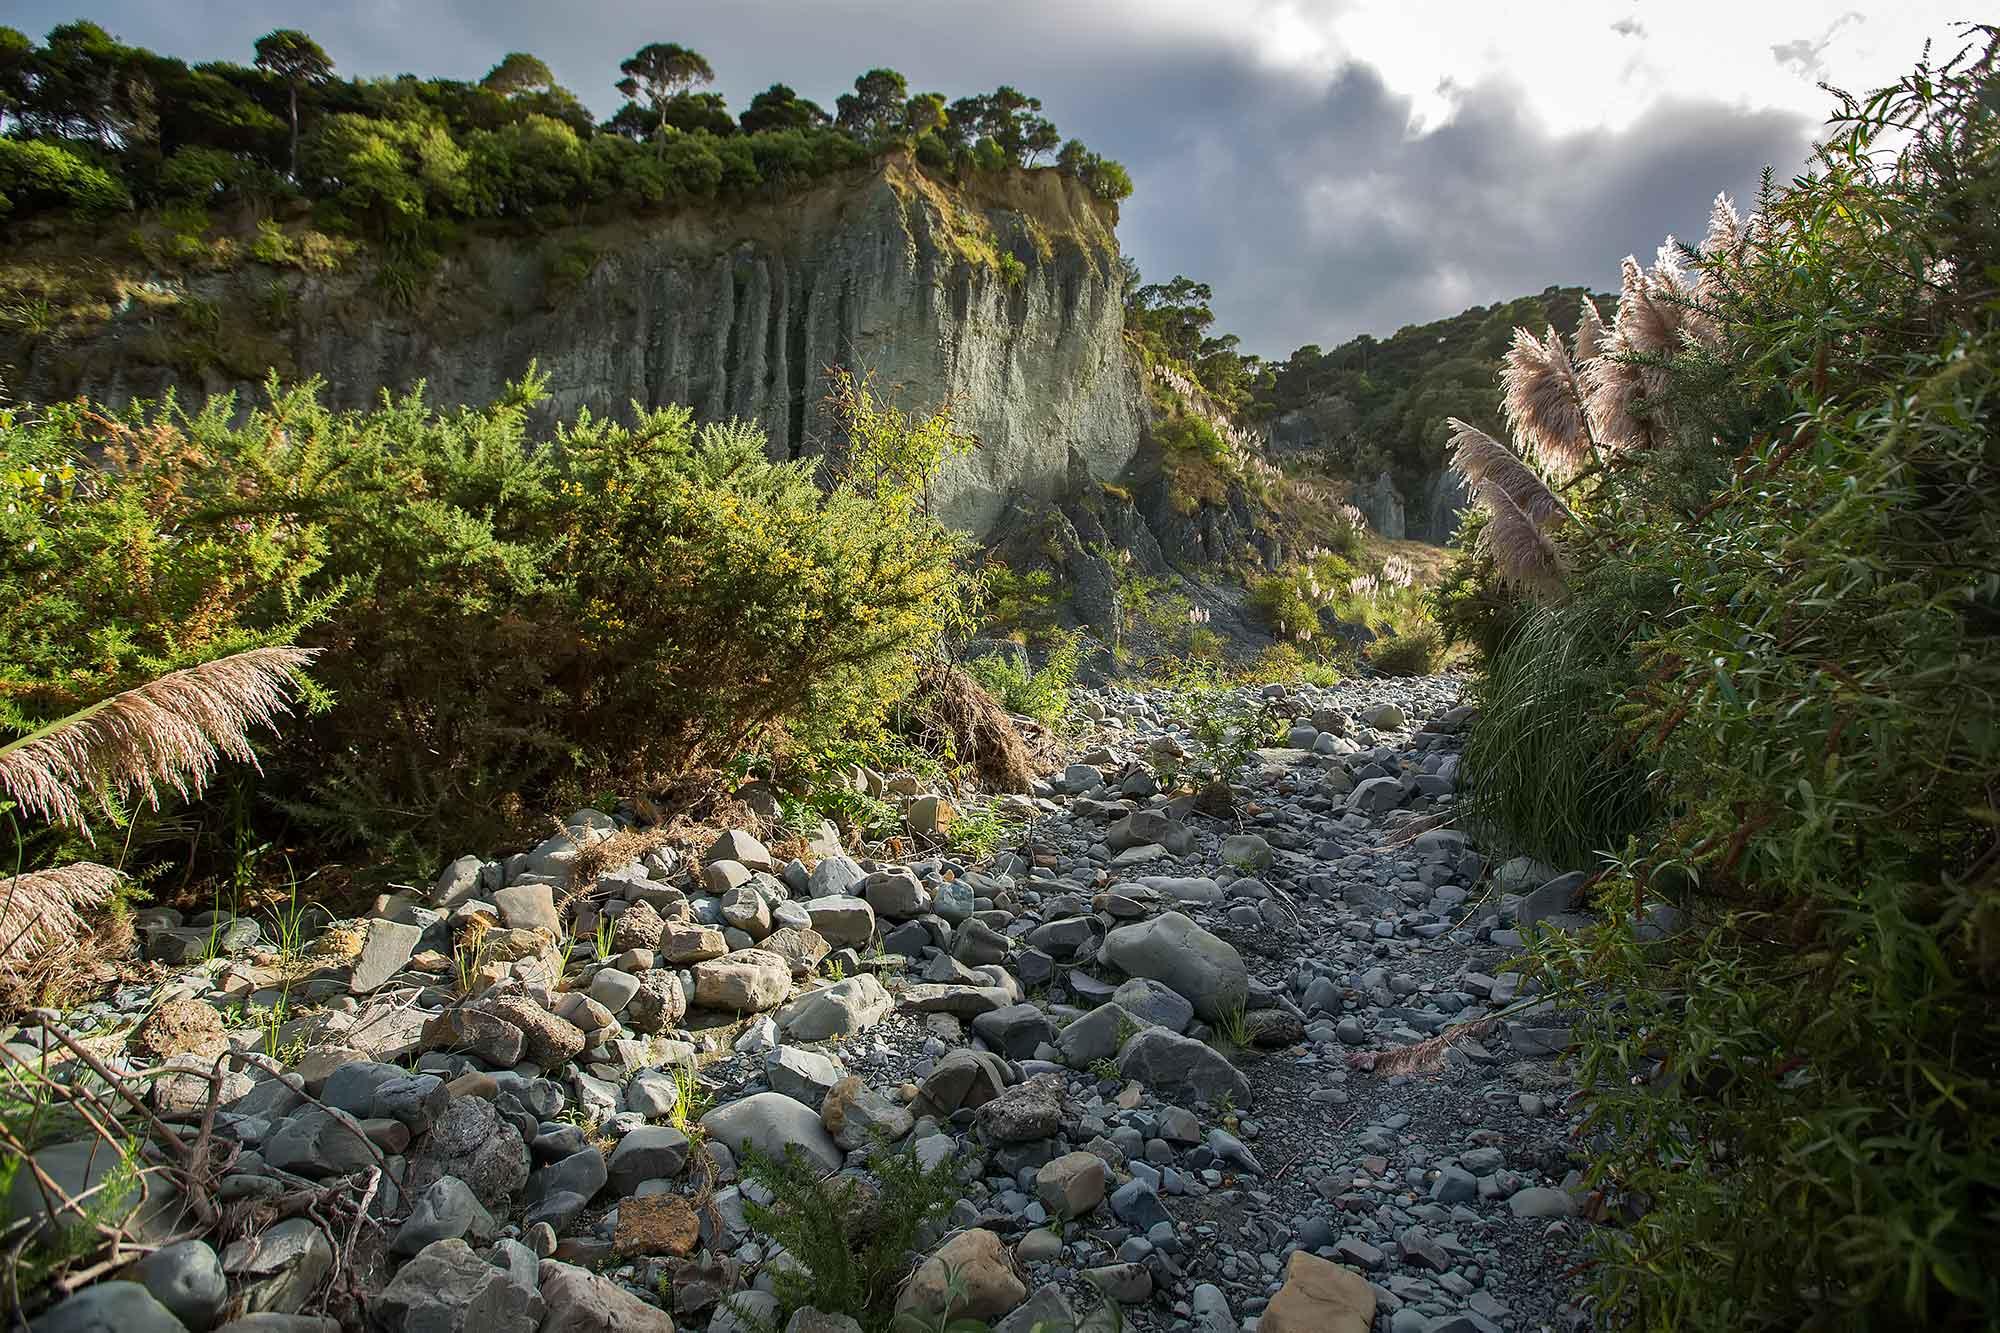 Puntangirua Pinnacles, Aorangi Forest Park in New Zealand. © Ulli Maier & Nisa Maier